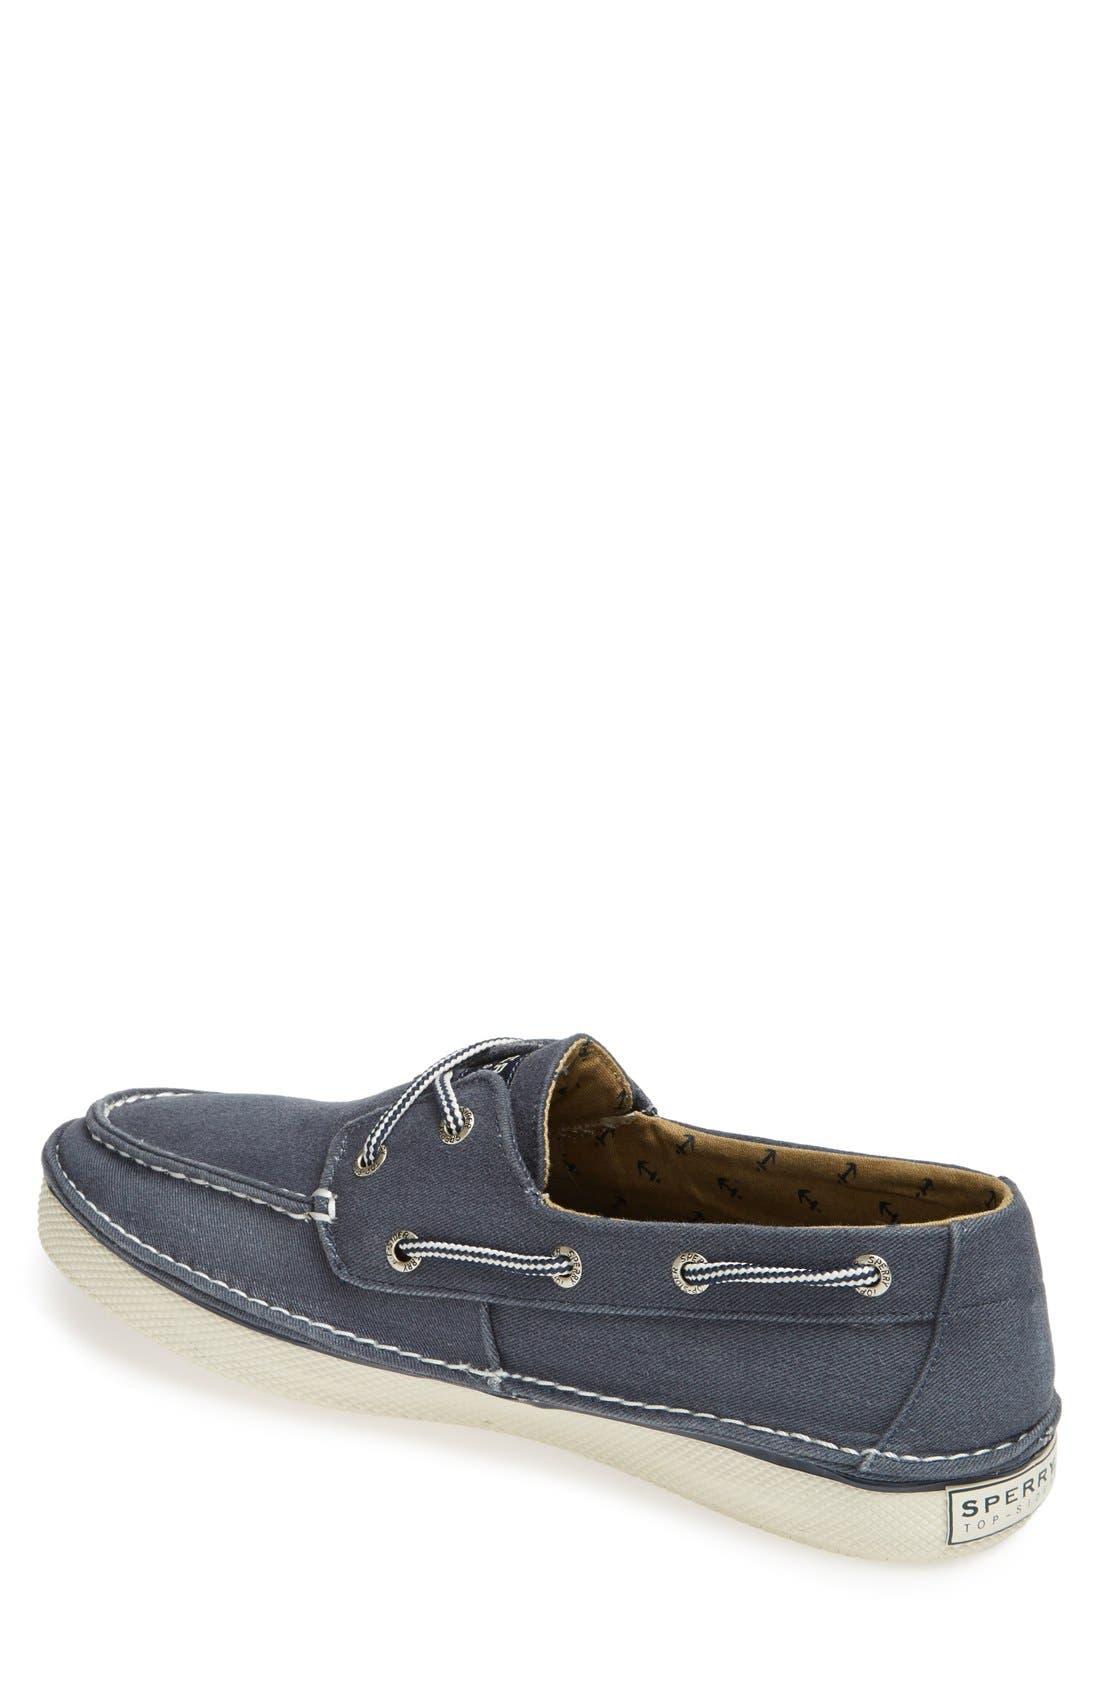 Alternate Image 2  - Sperry 'Cruz' Canvas Boat Shoe (Men)